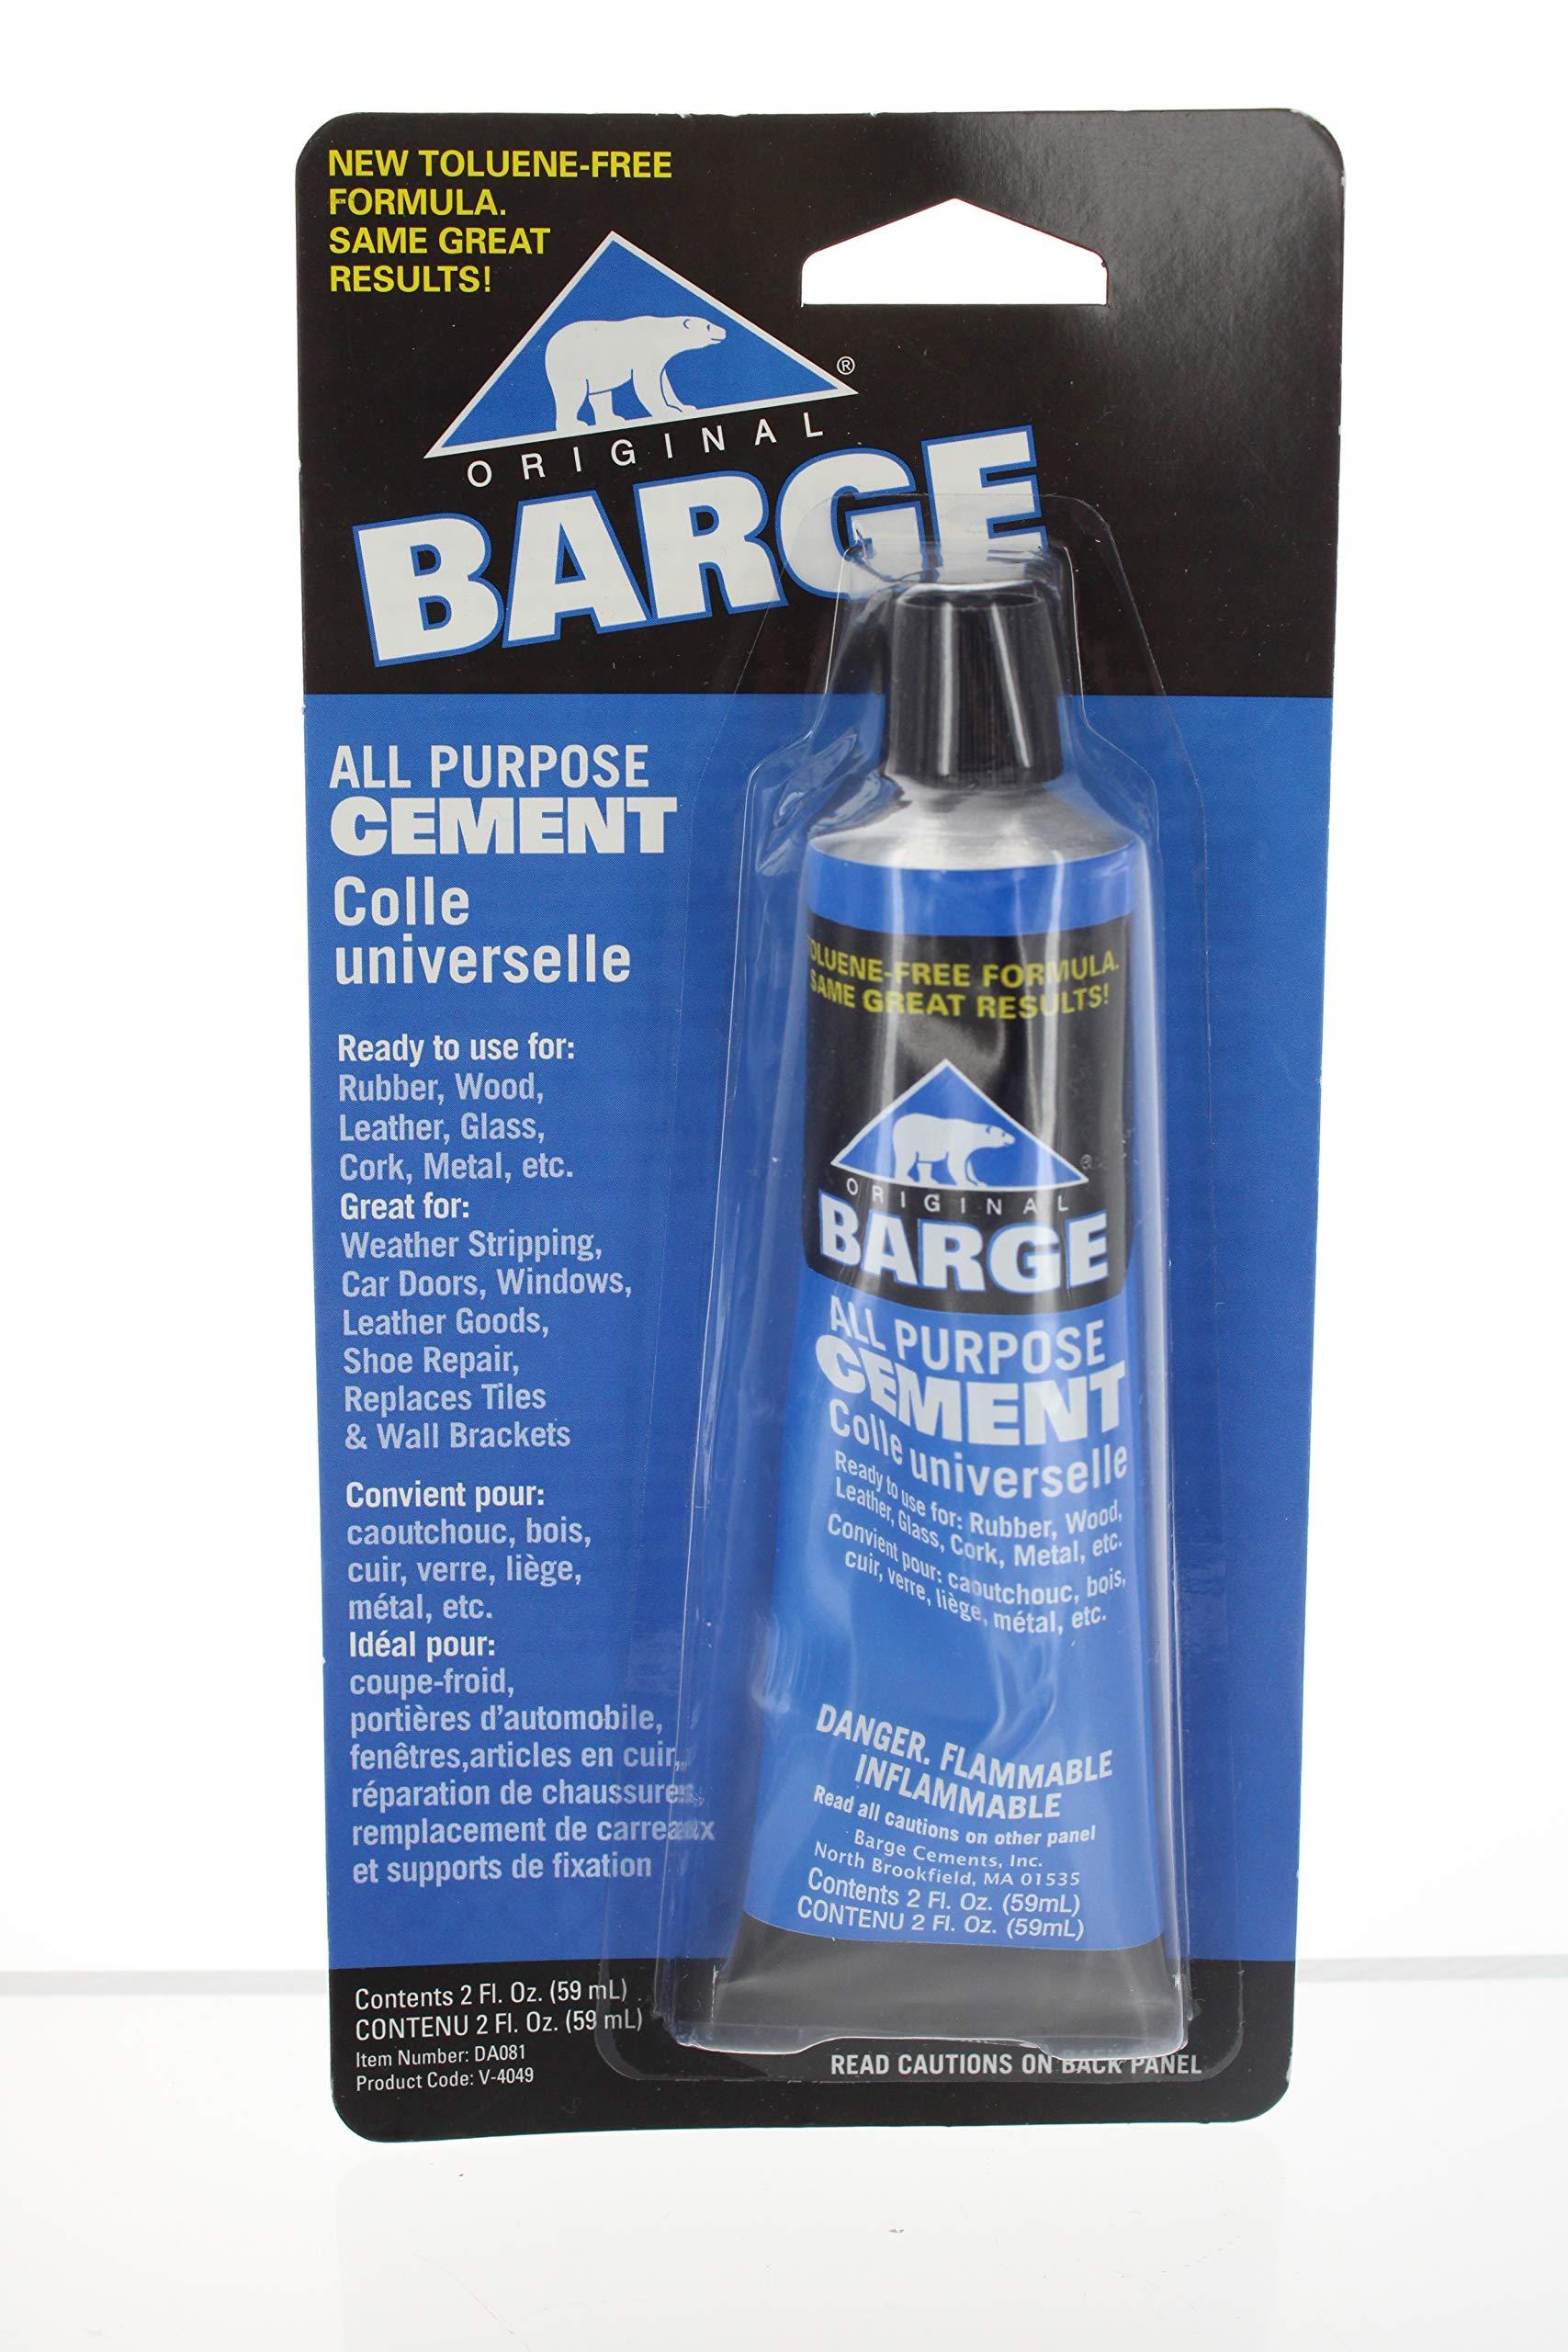 Barge Original All Purpose Cement 2oz Tube Adhesive Glue (2-Pack)